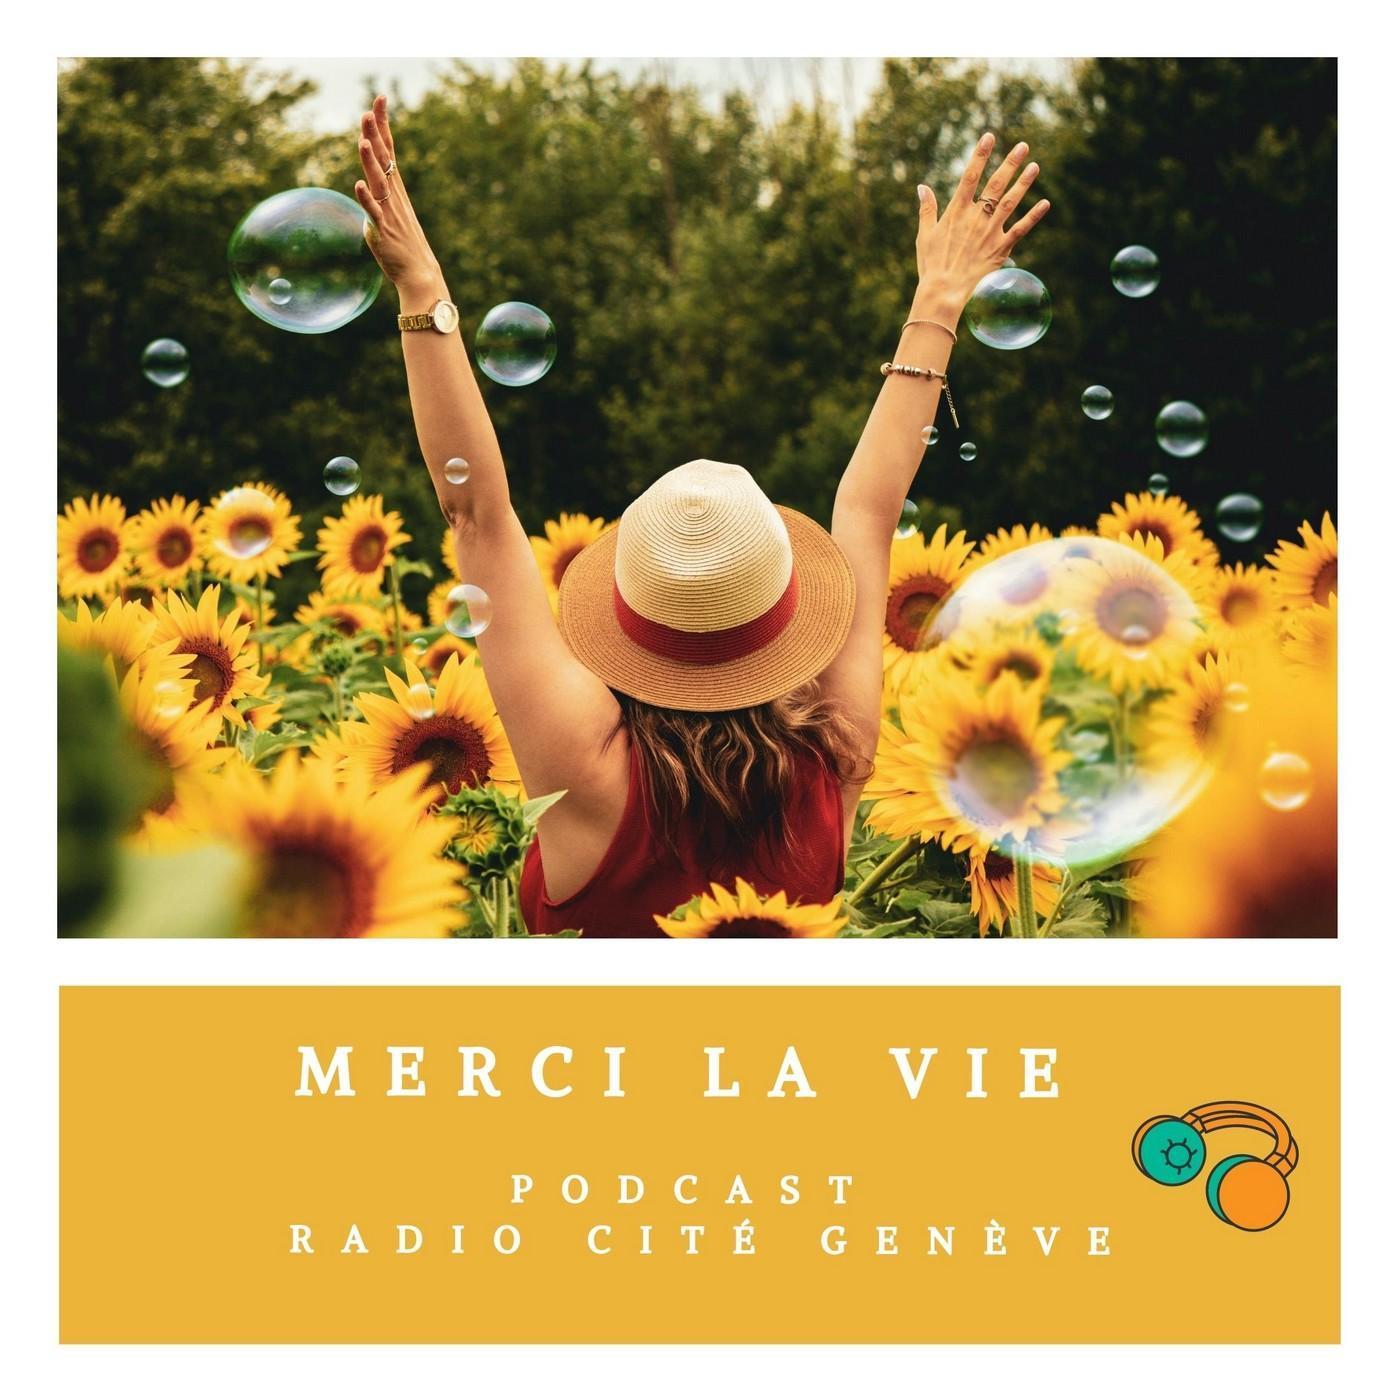 Merci la Vie du 27/04/21 - Aurélie Friedli